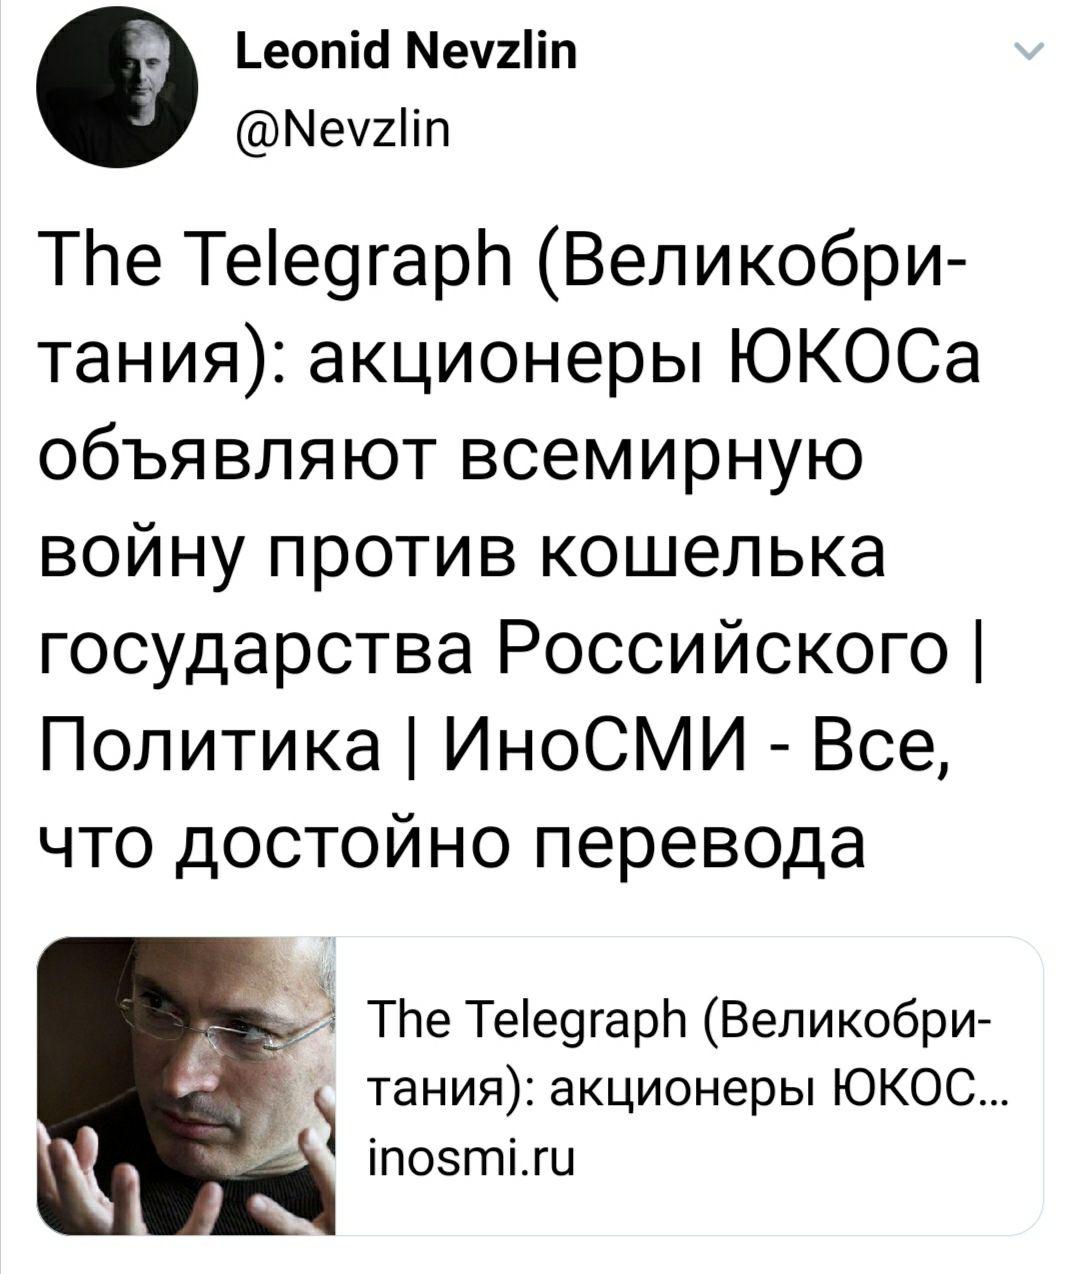 https://i1.imageban.ru/out/2020/03/01/5d9d616b13902f702a664e86efad48c0.jpg